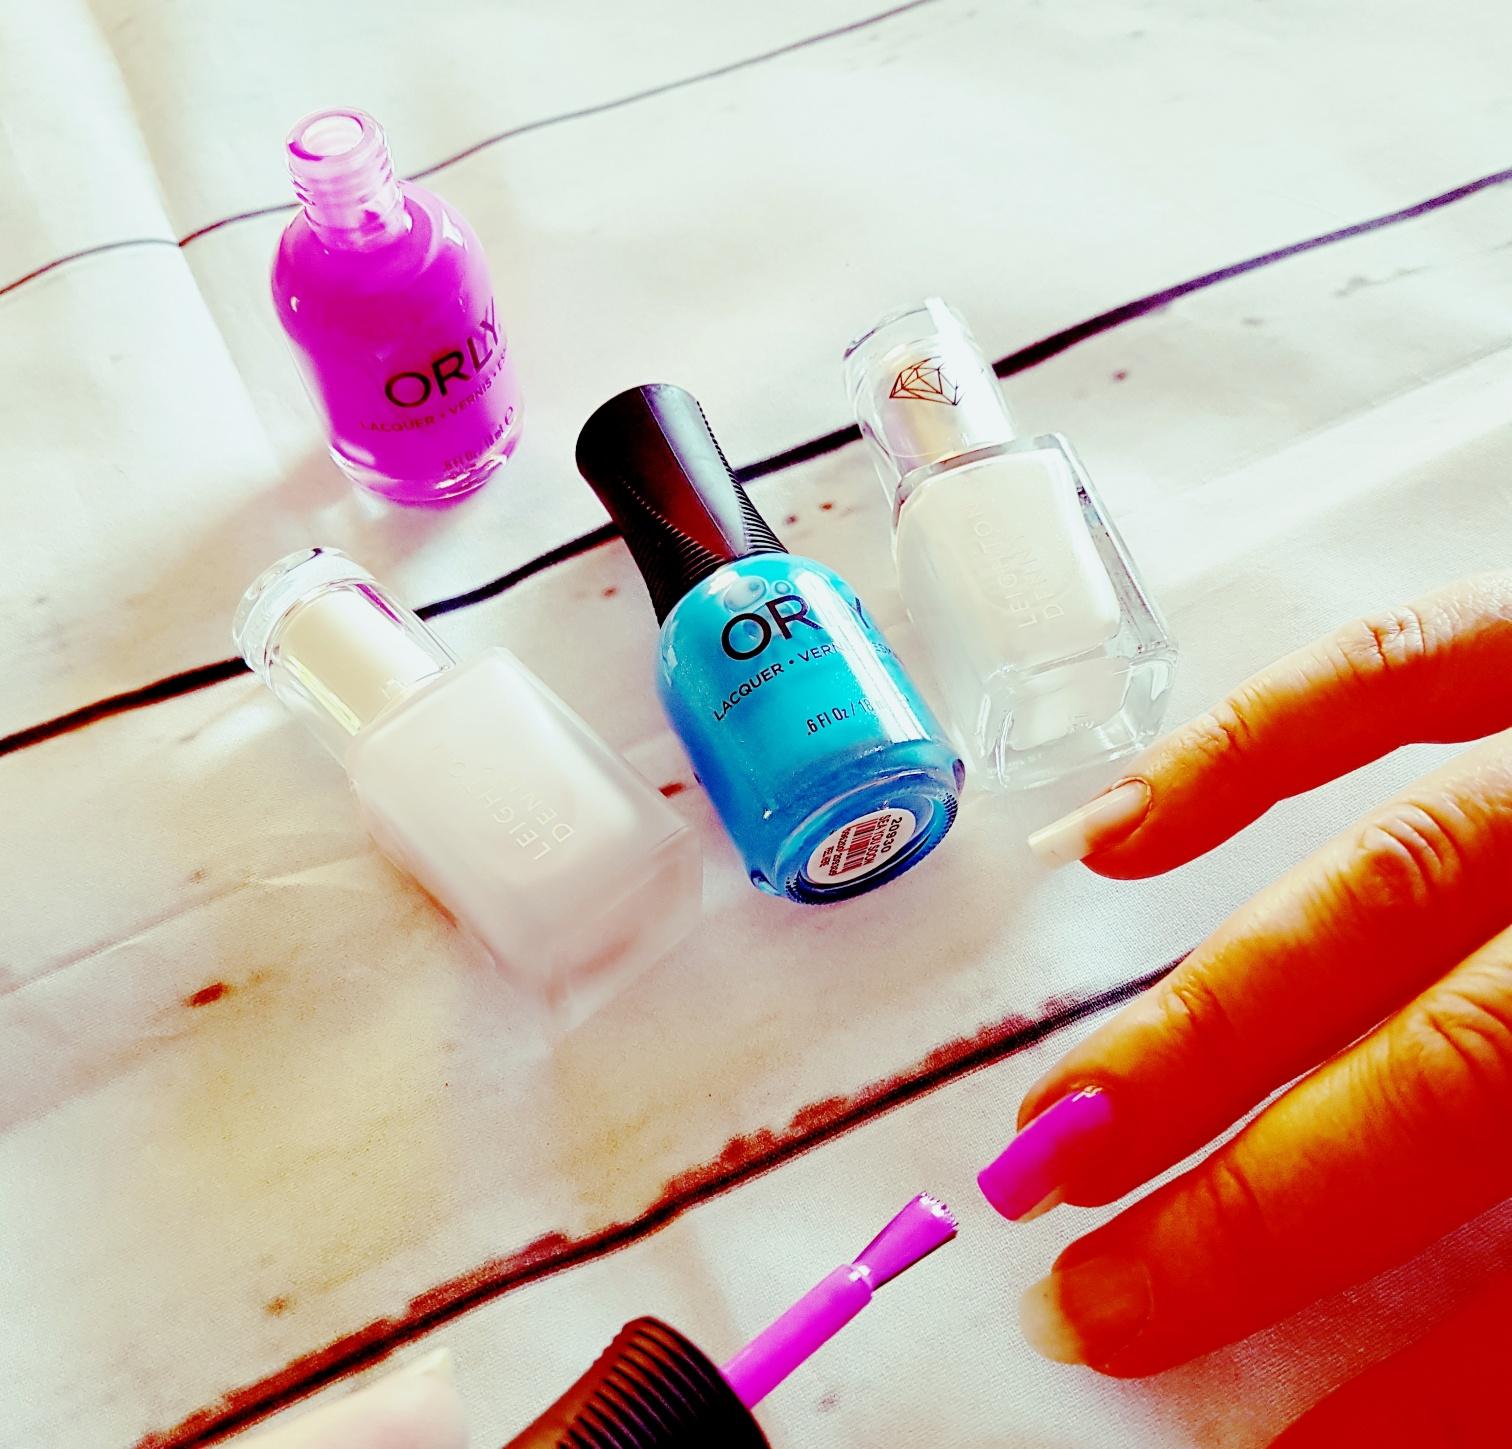 brighten up those mum nails